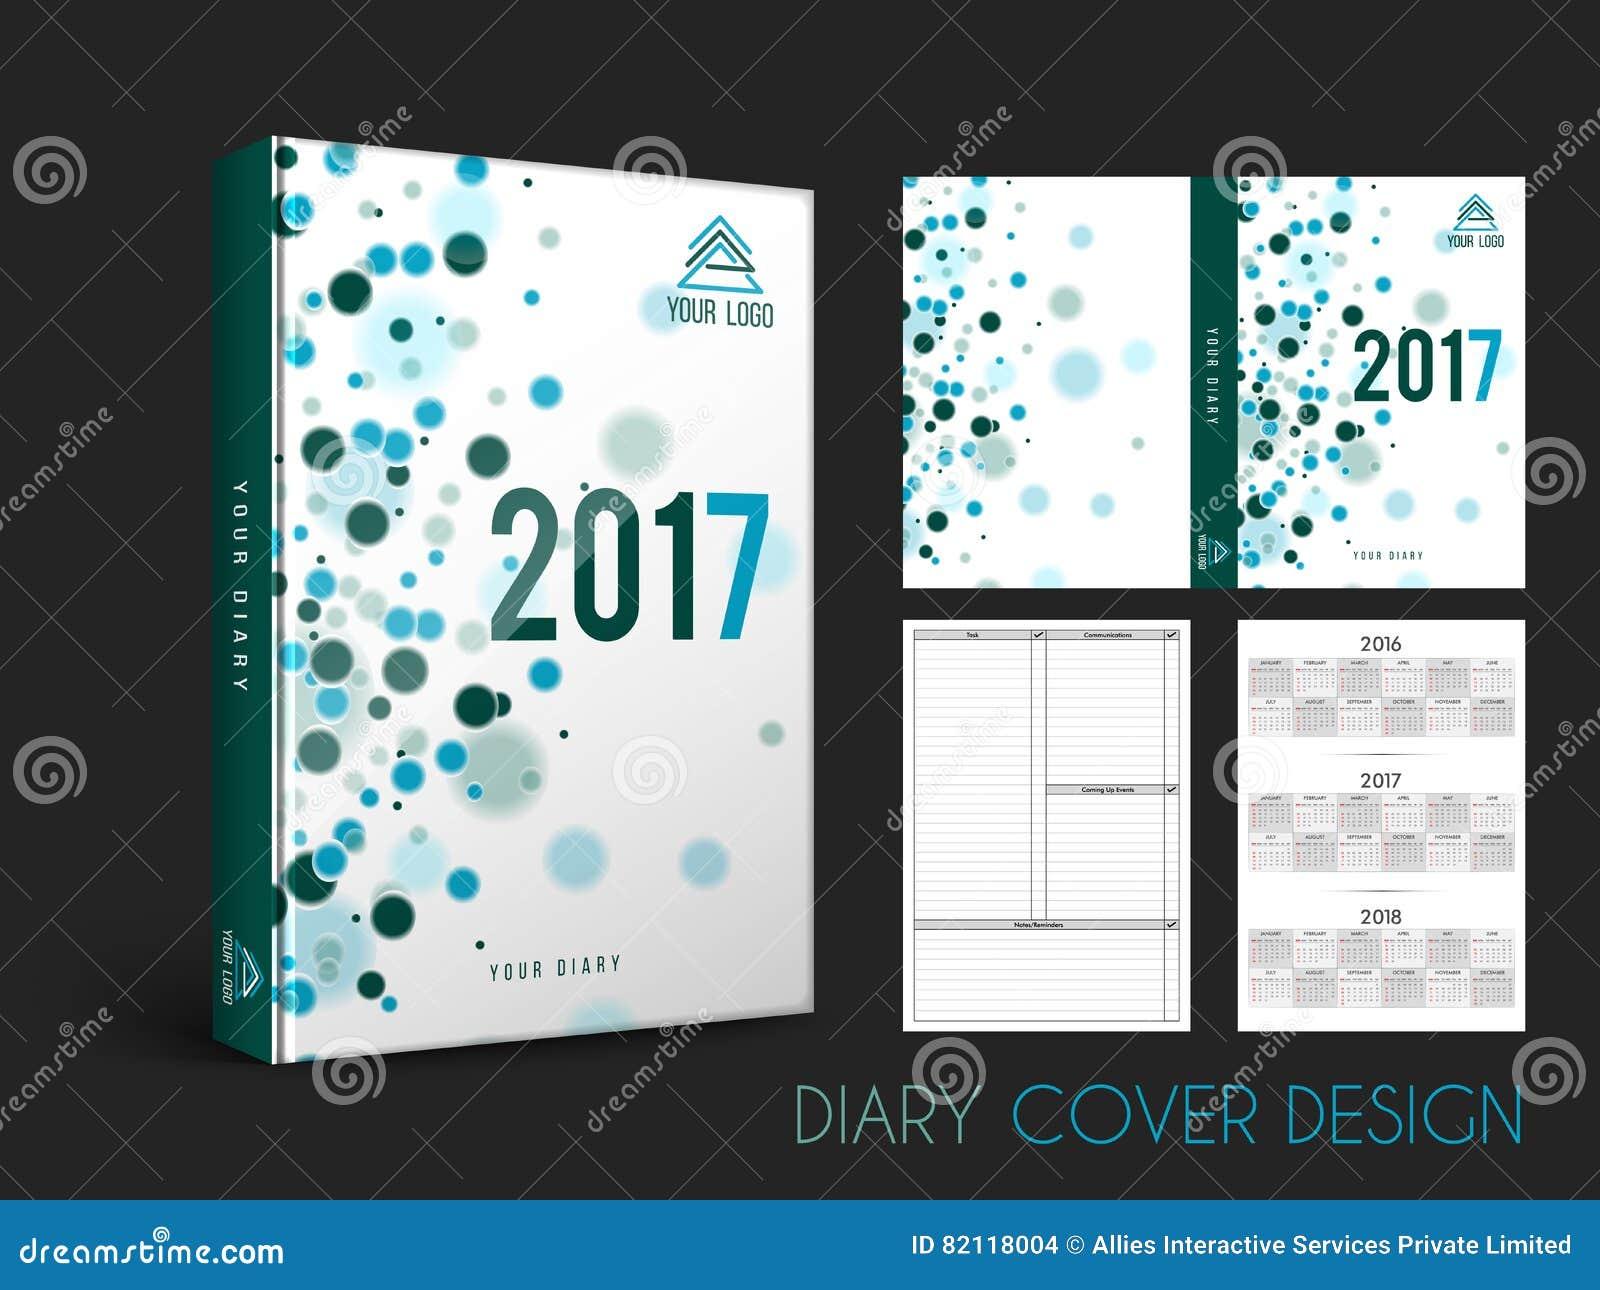 Creative Diary Cover Design